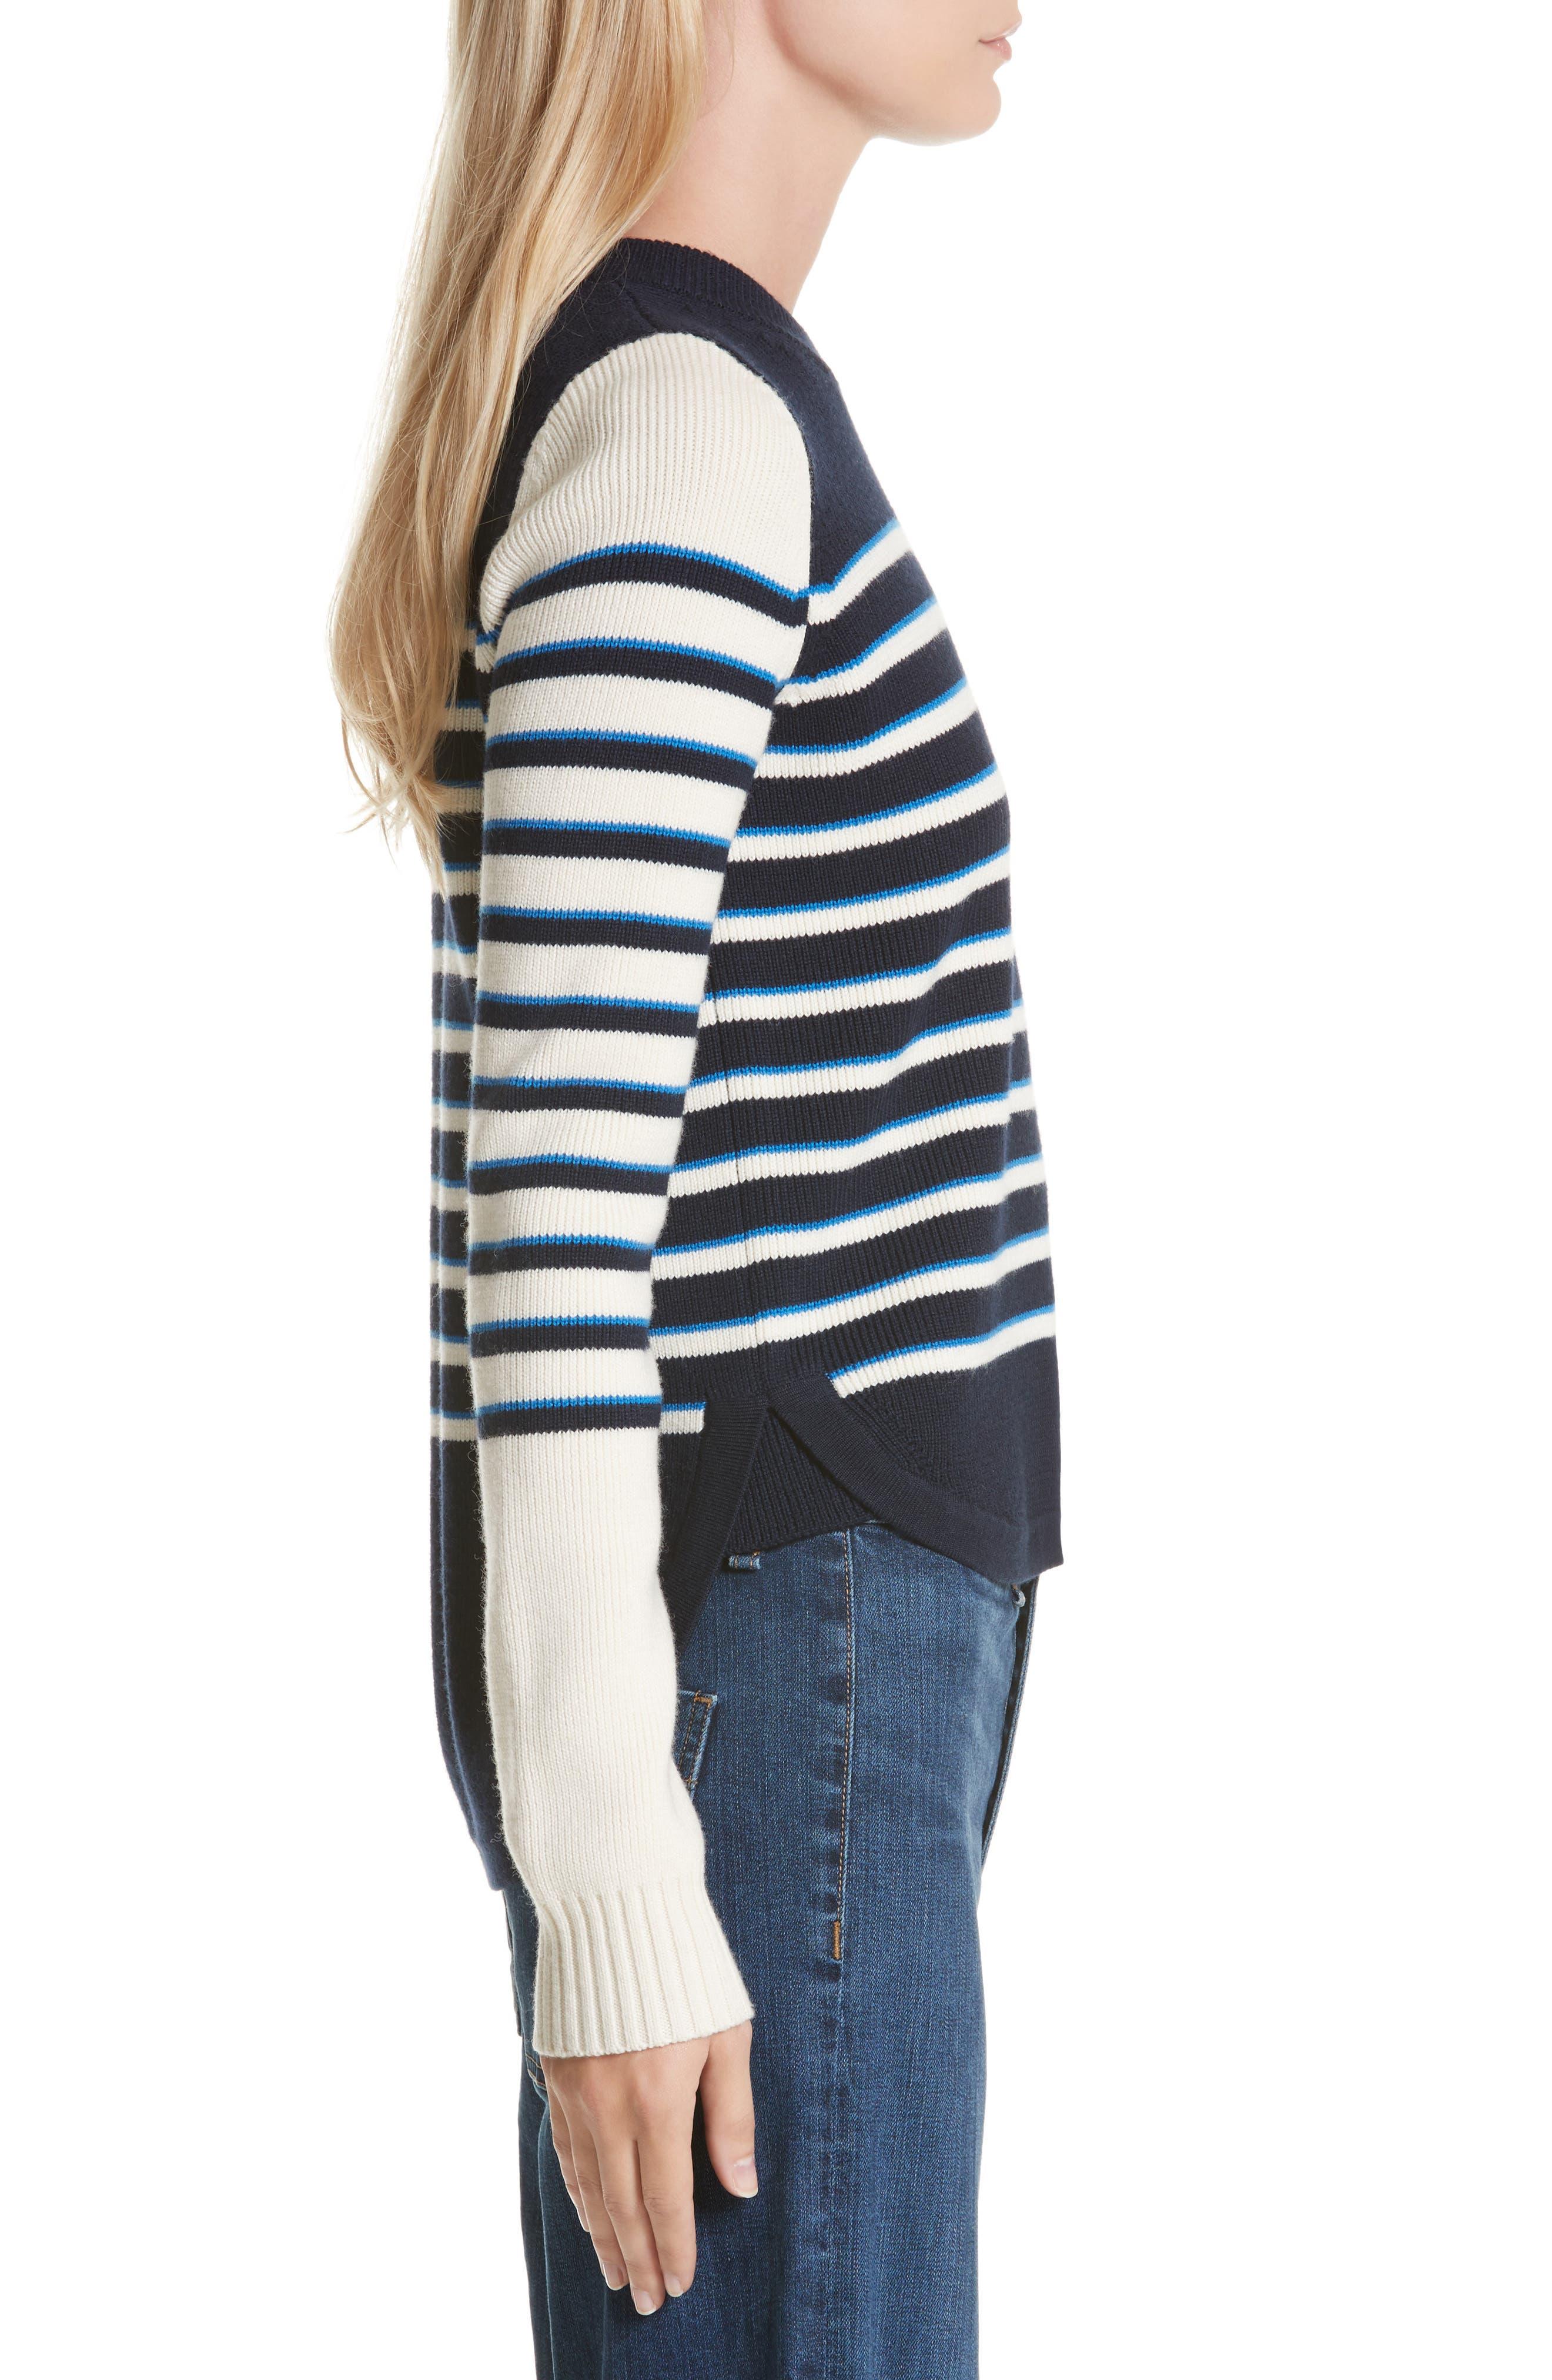 Amos Stripe Merino Wool Sweater,                             Alternate thumbnail 3, color,                             Navy/ Ivory/ Blue